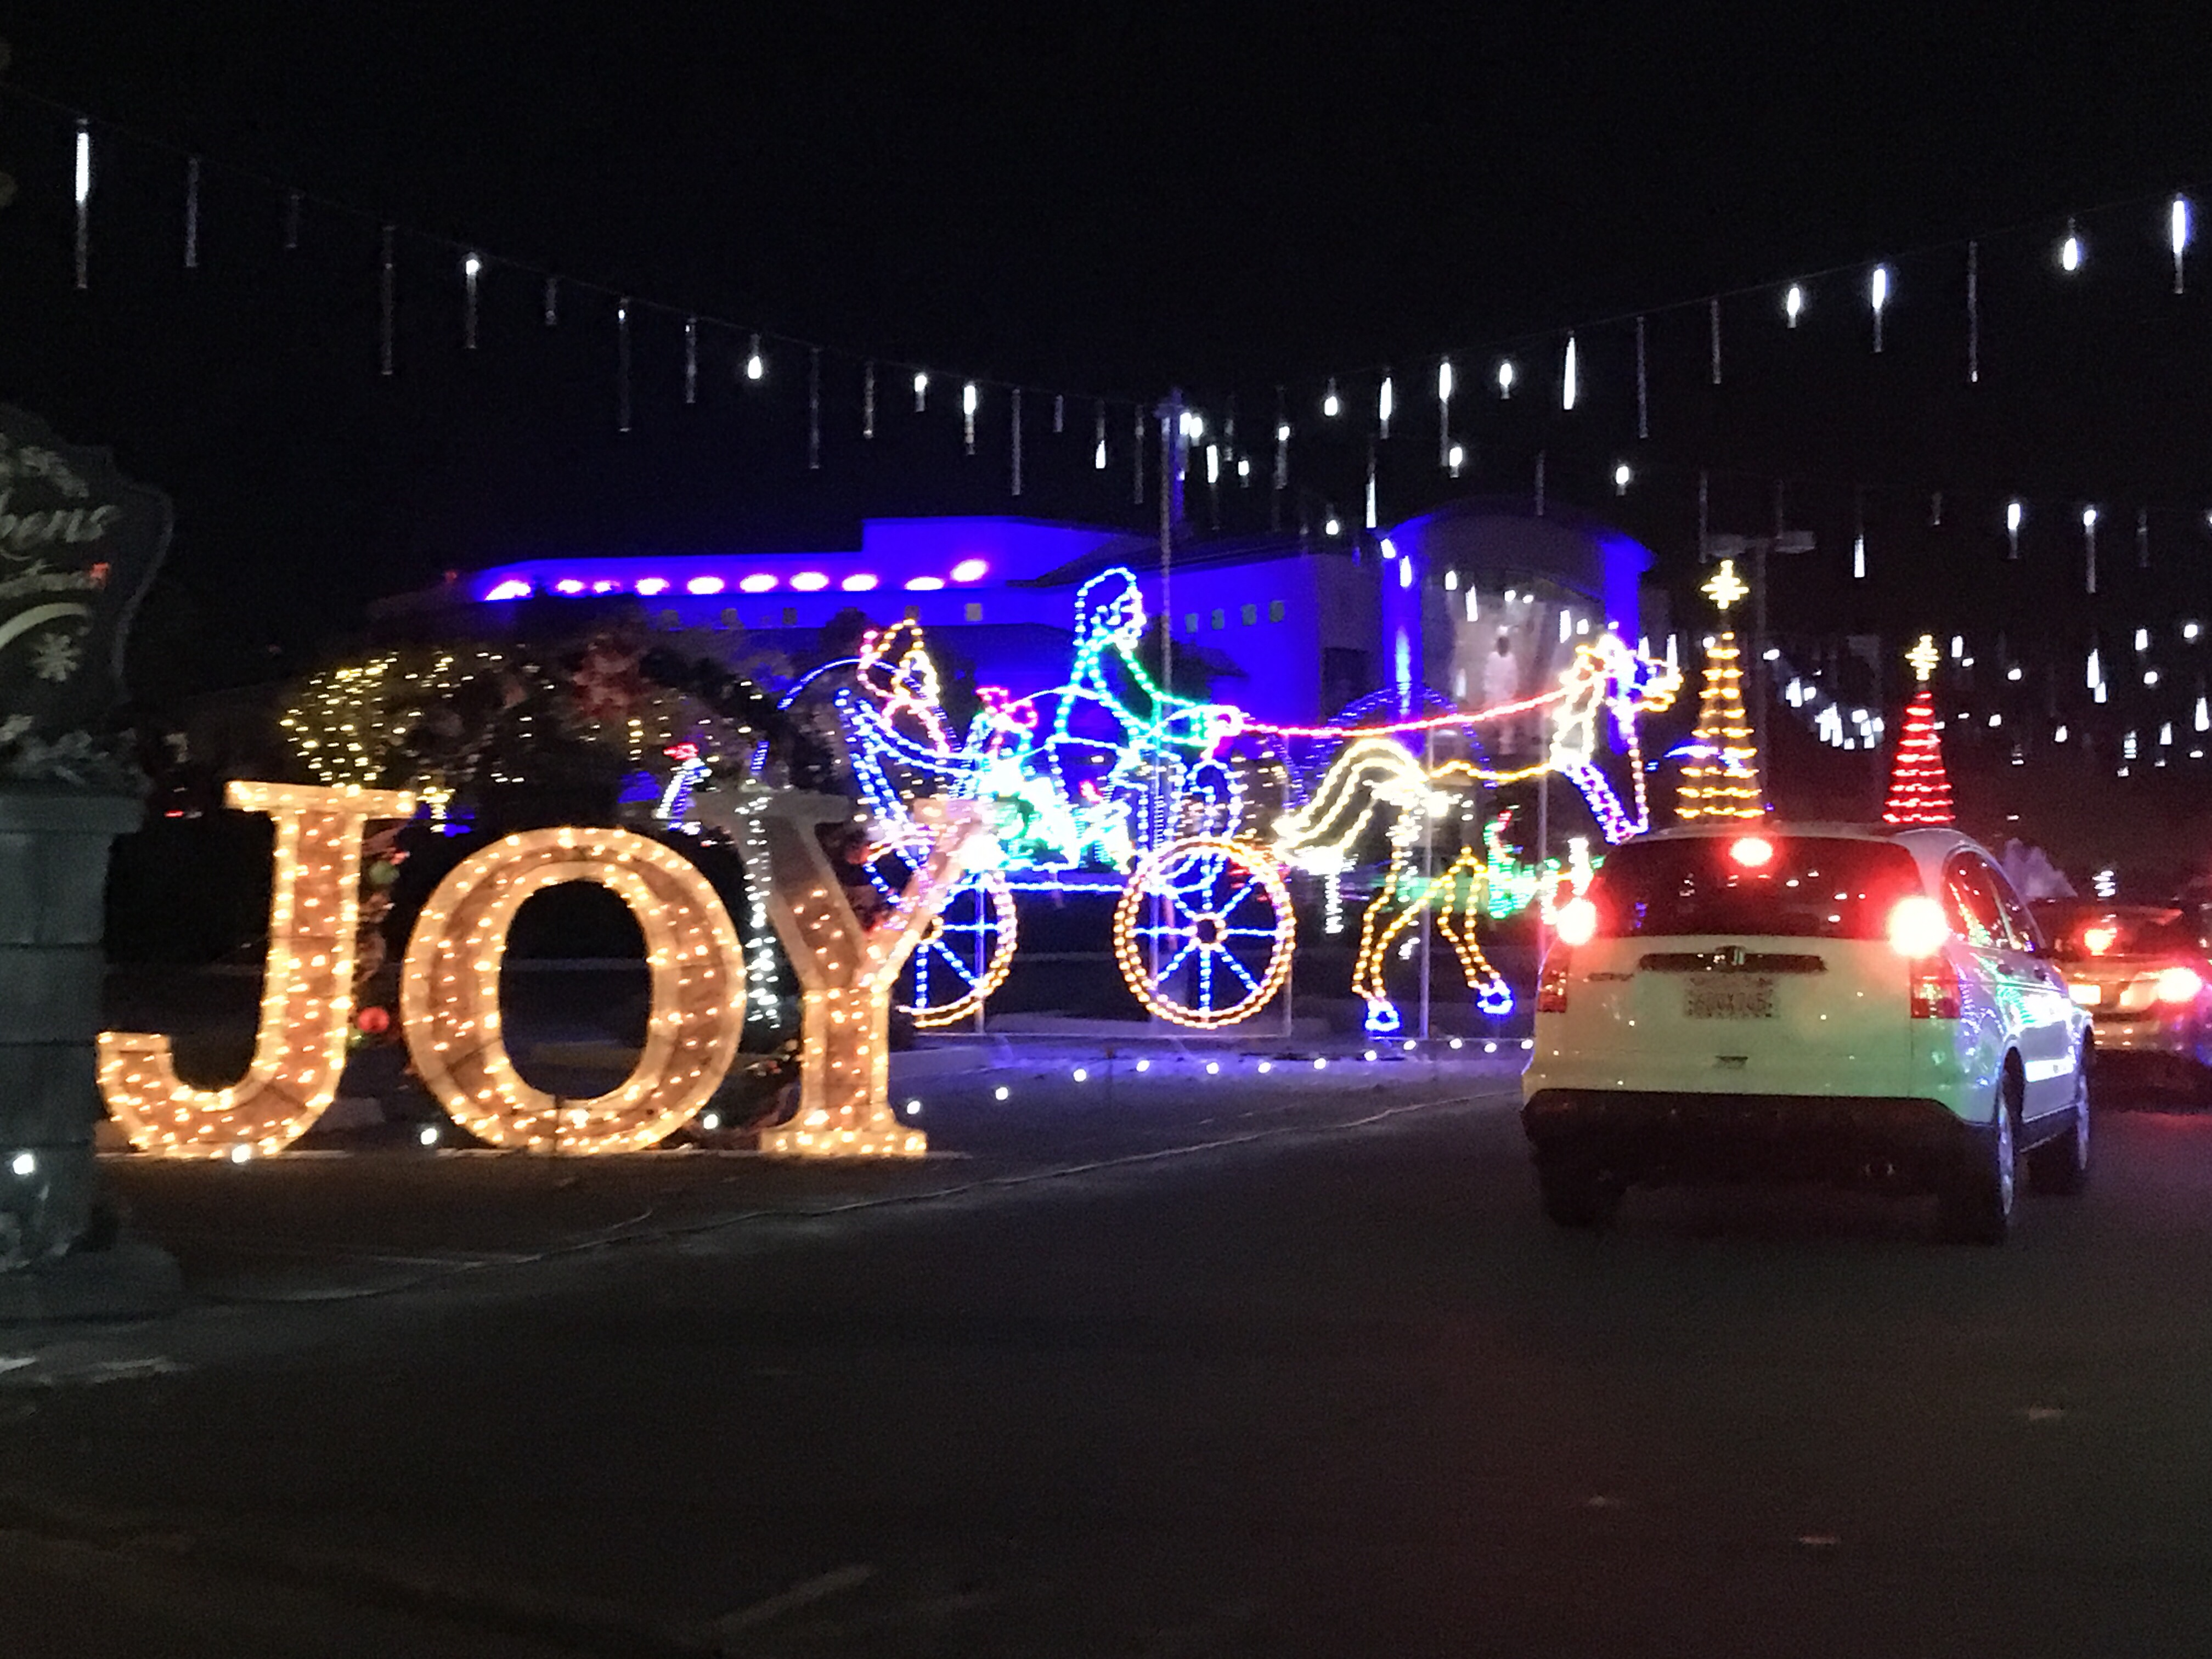 Drive Thru Christmas Lights.Adventure Christmas Lights Drive Thru This Mom Is Going Places